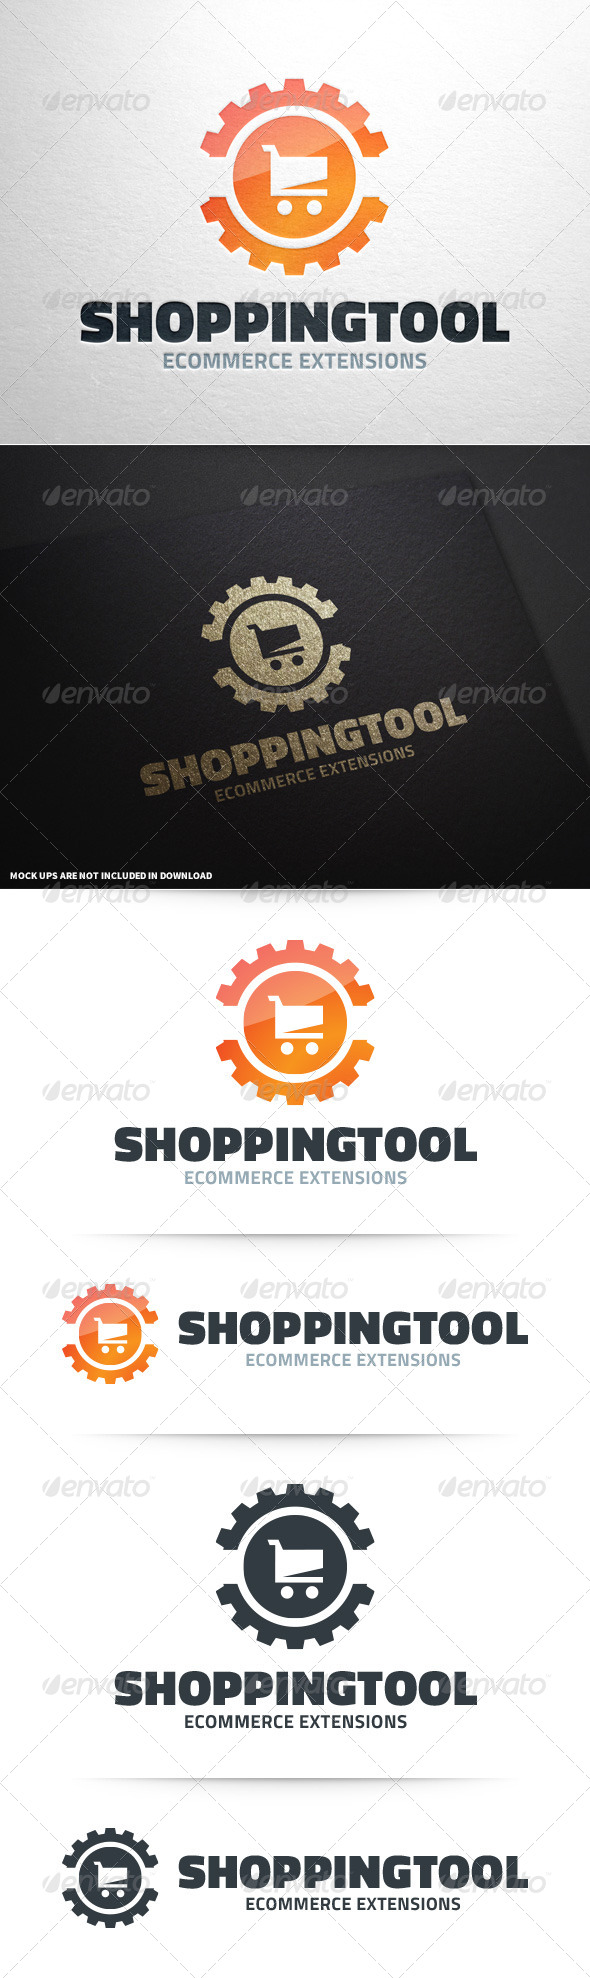 GraphicRiver Shopping Tool Logo Template 8632488